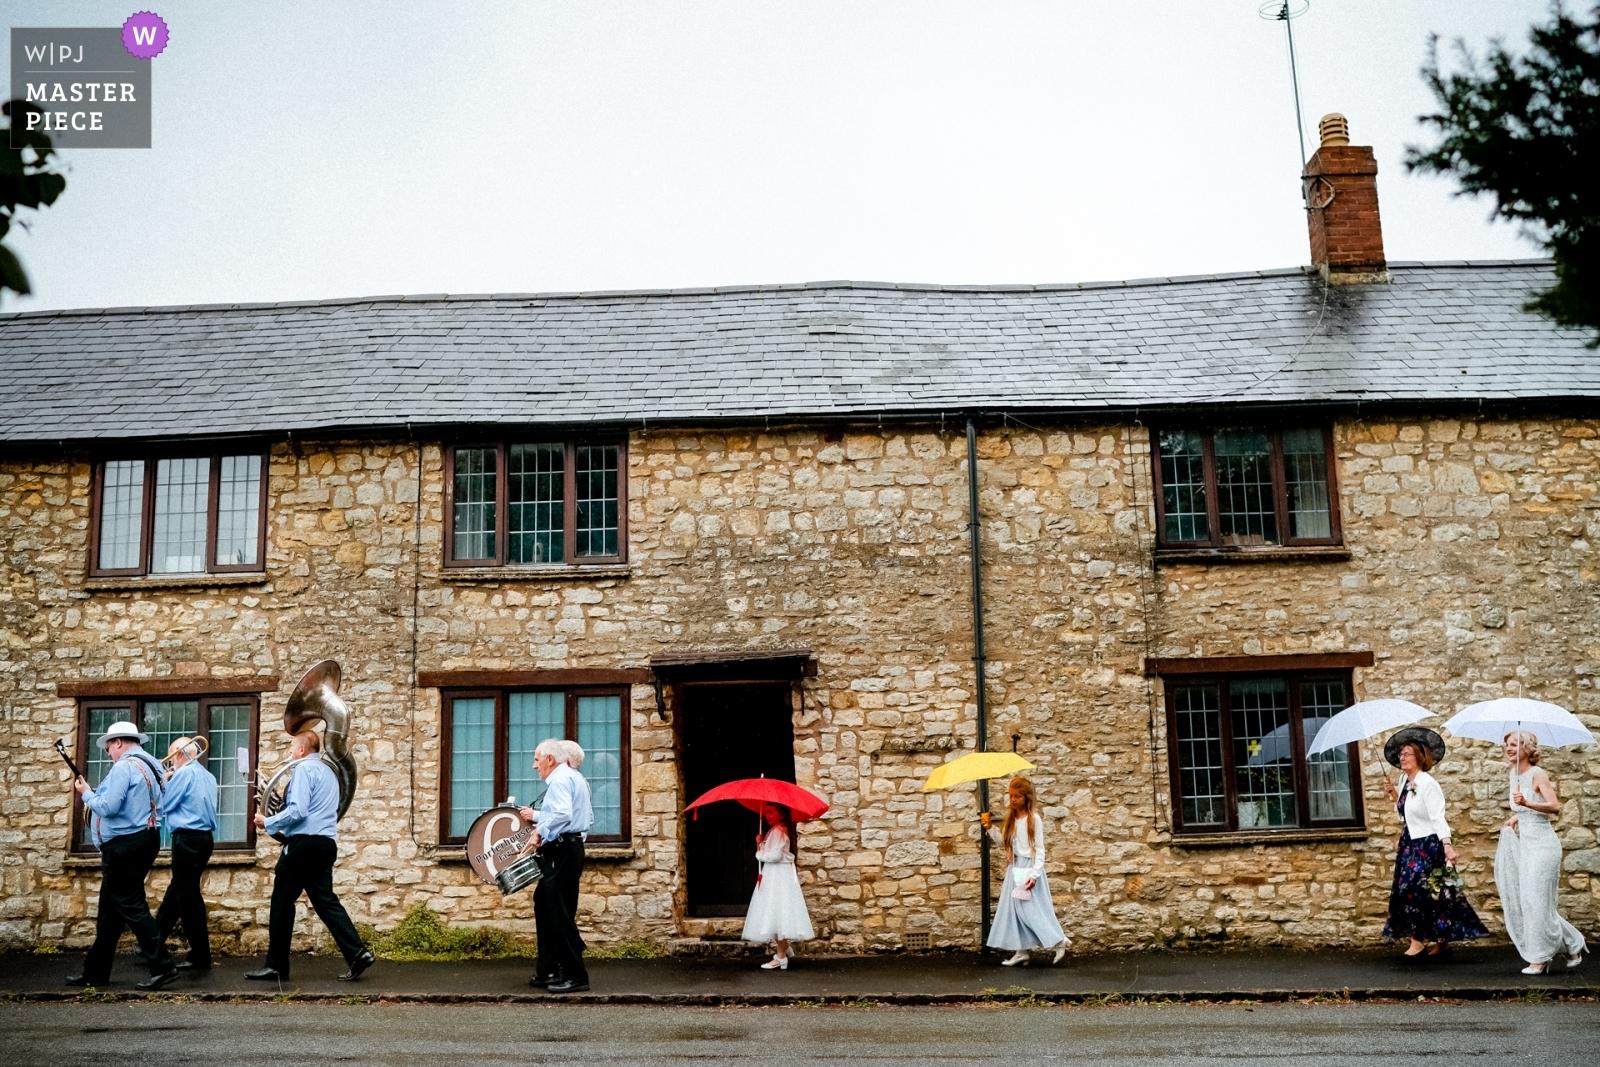 Kate walking to church, led by a band. - Hertfordshire, England Wedding Photography -  | Brackley, Northamptonshire, UK